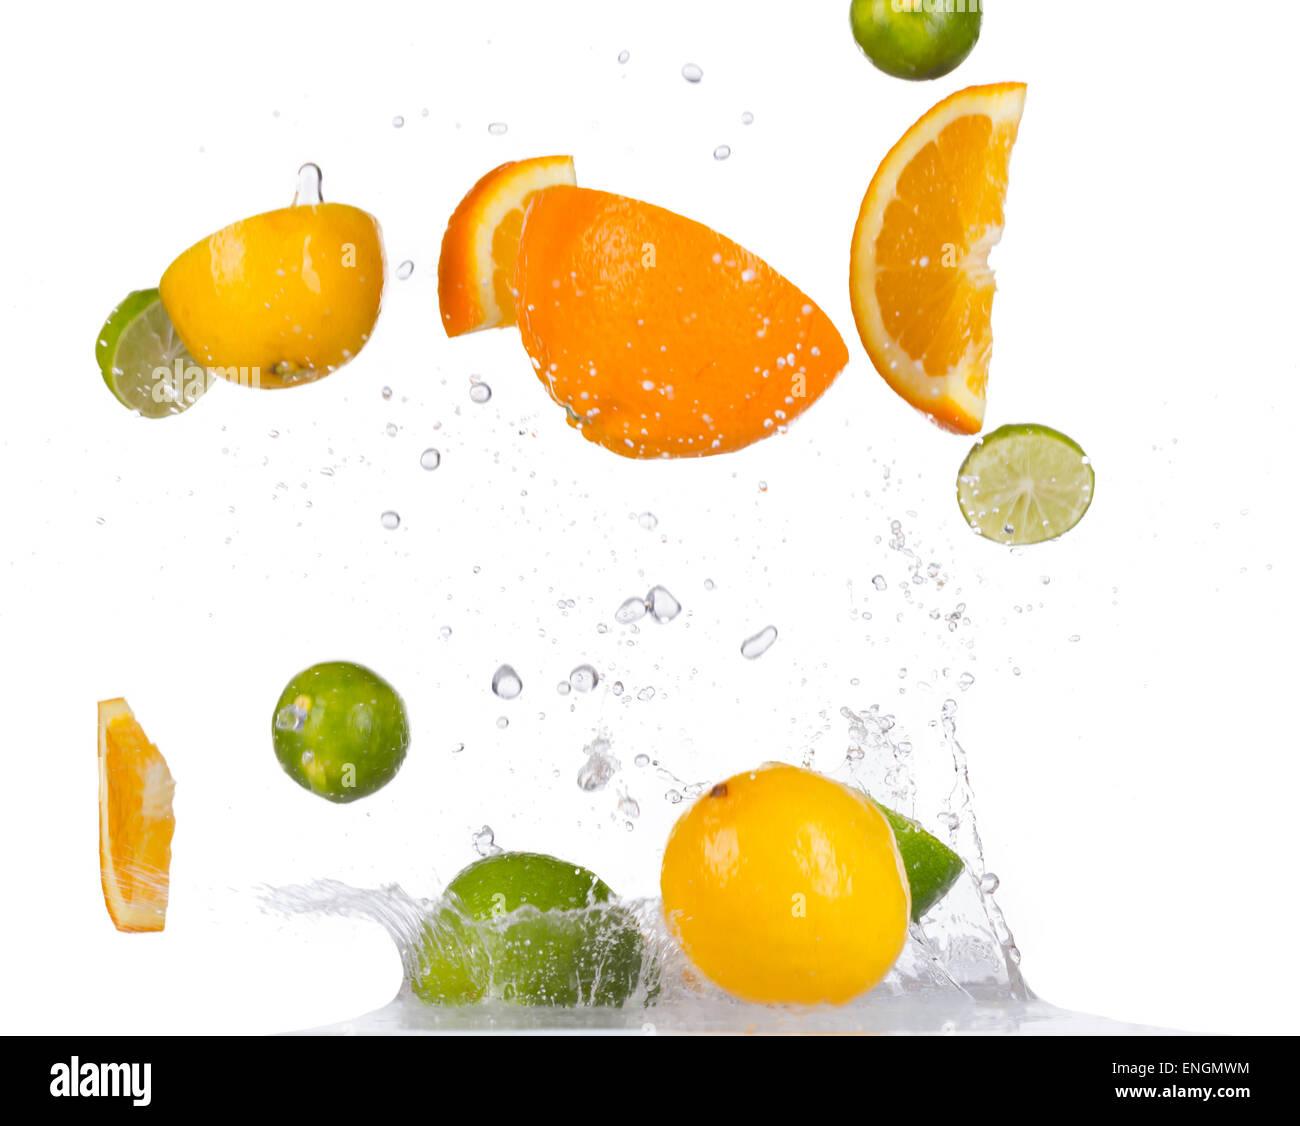 Fresh oranges, limes and lemons with water splashes isolated on black background - Stock Image